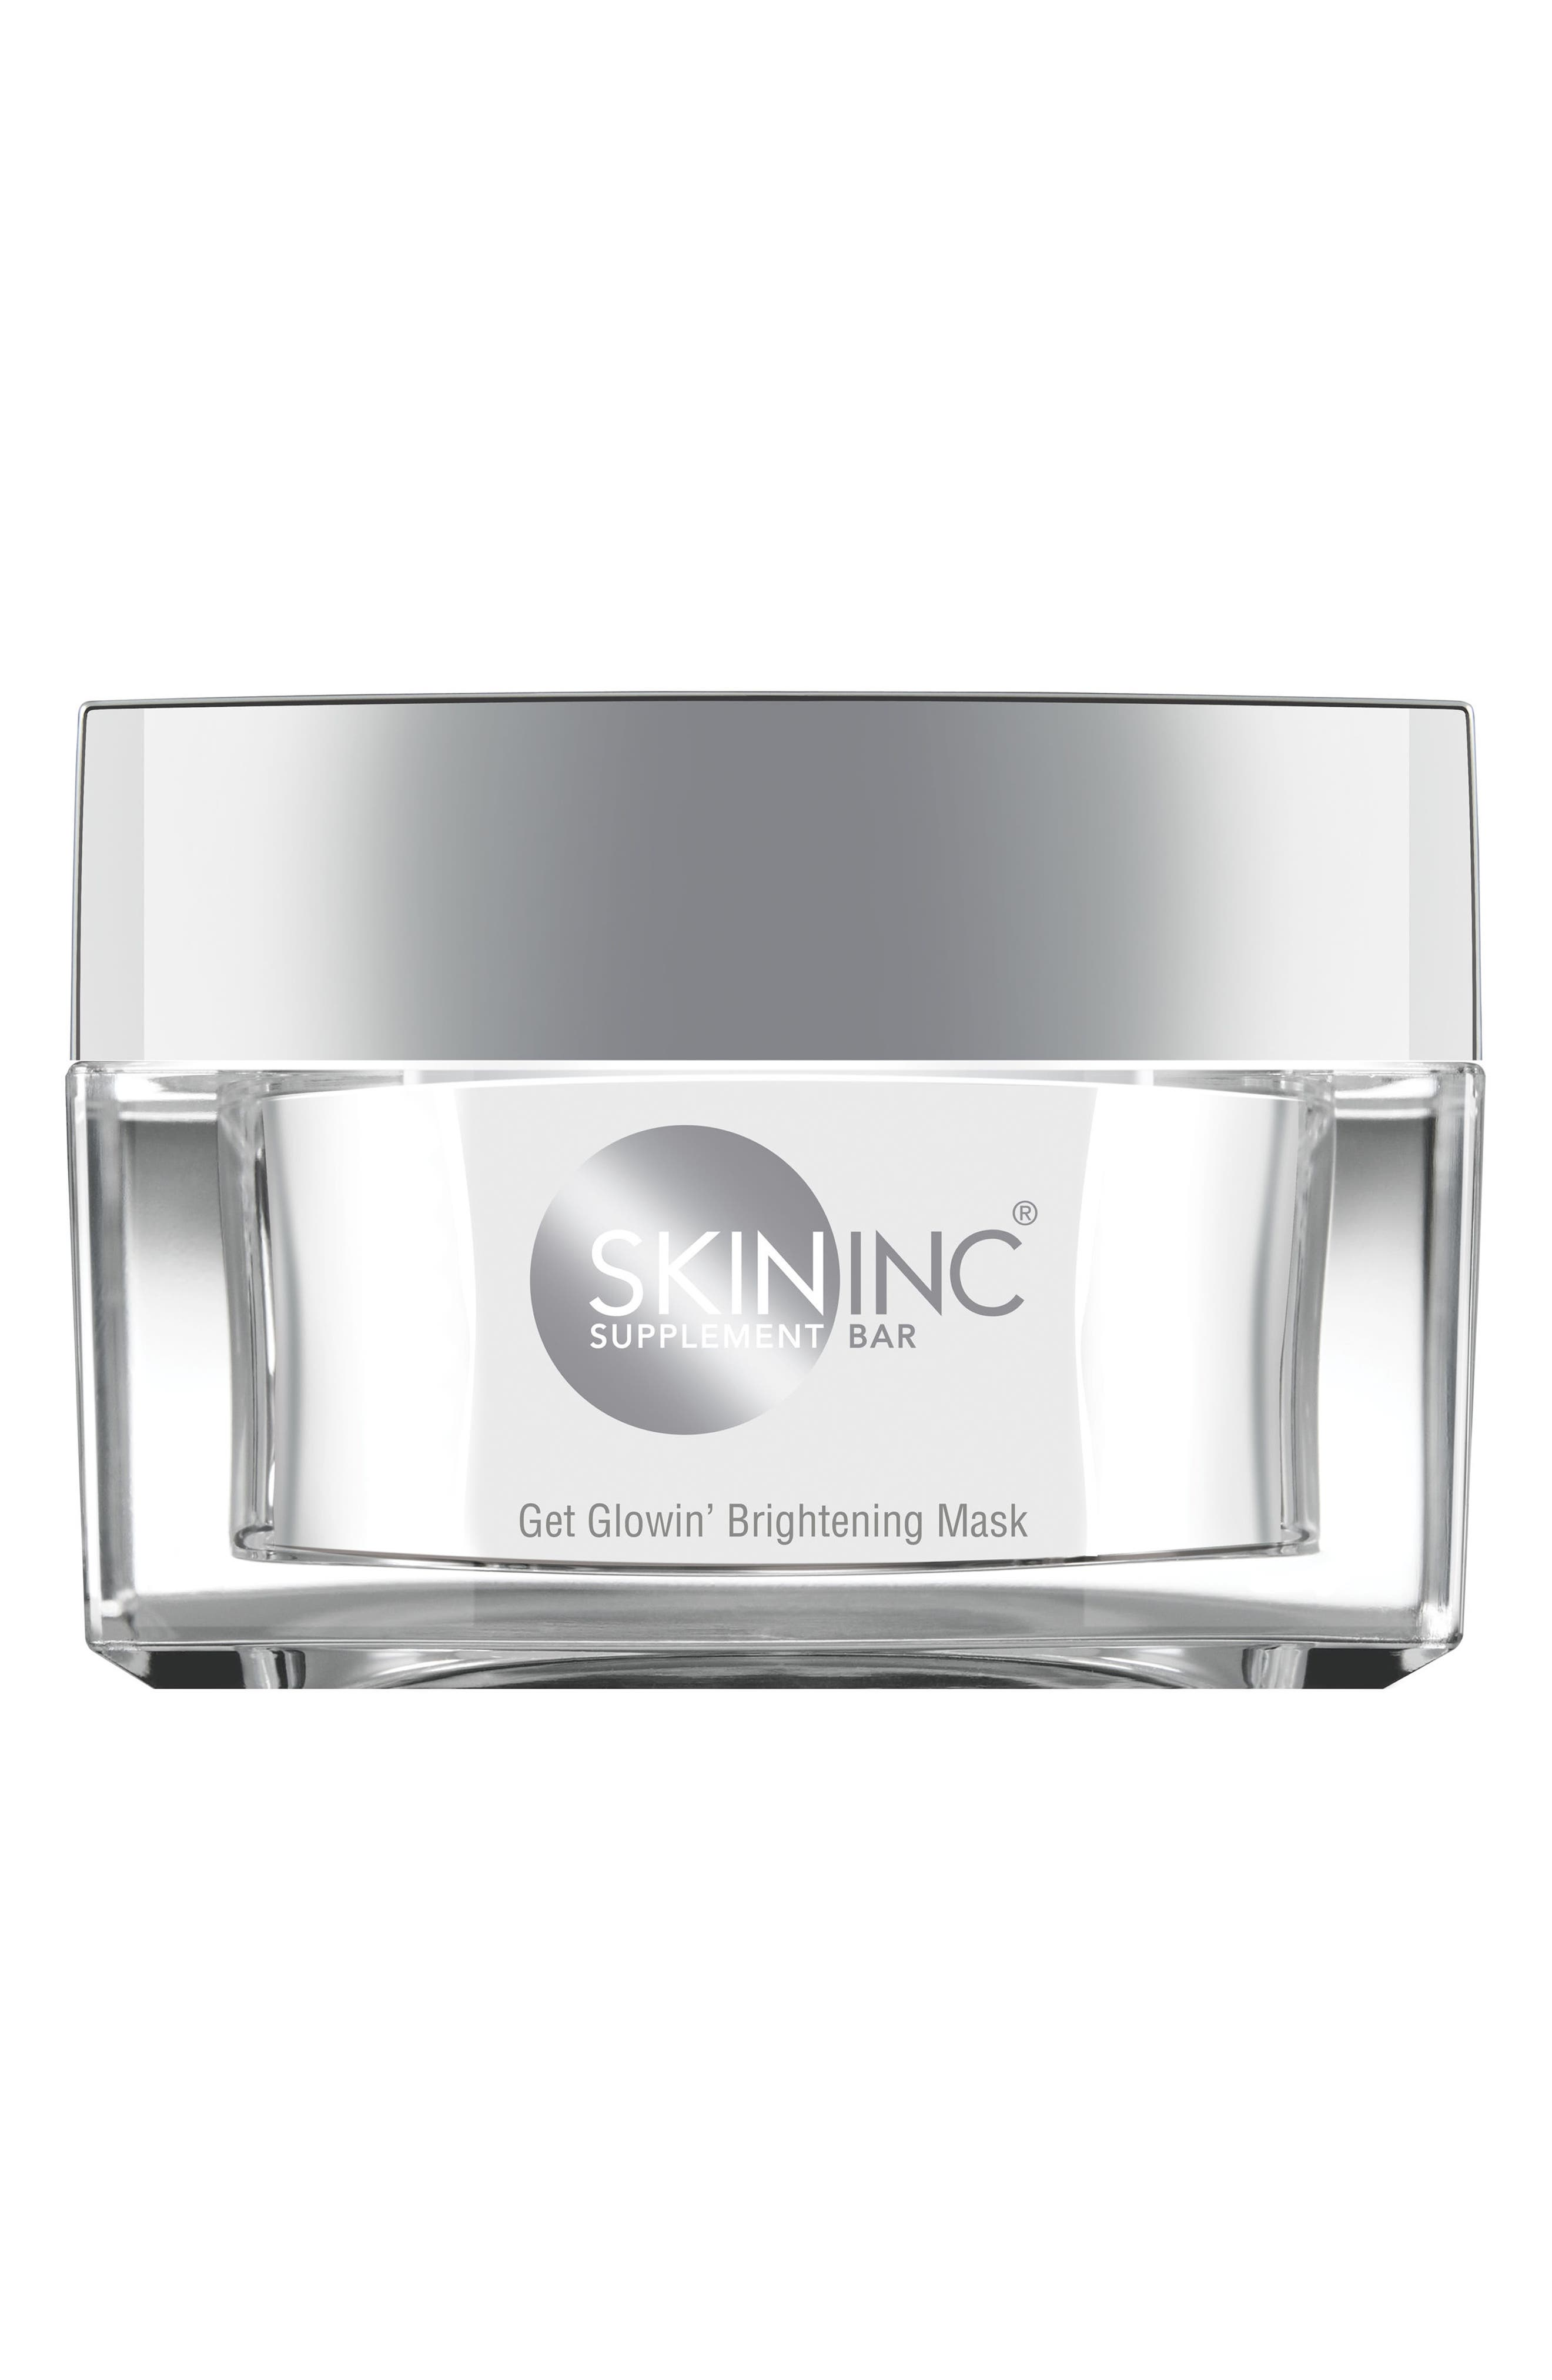 Skin Inc. Get Glowin' Brightening Mask